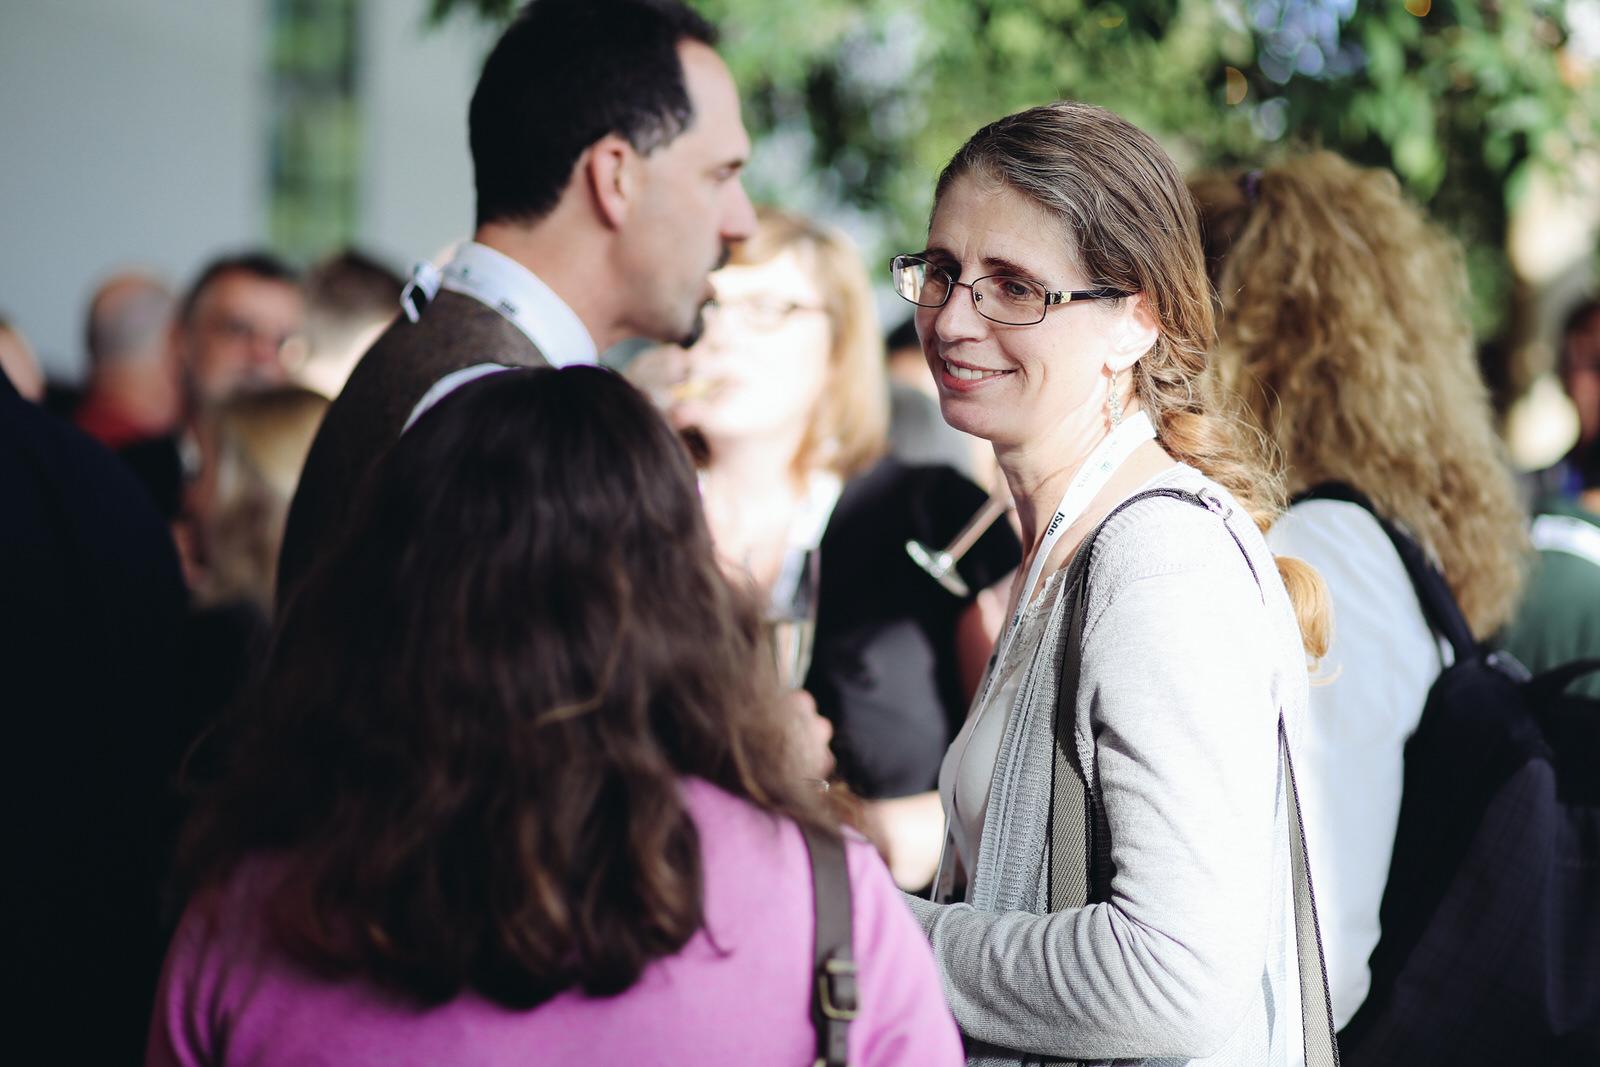 Corporate-conference-photographer-dublin-018.jpg